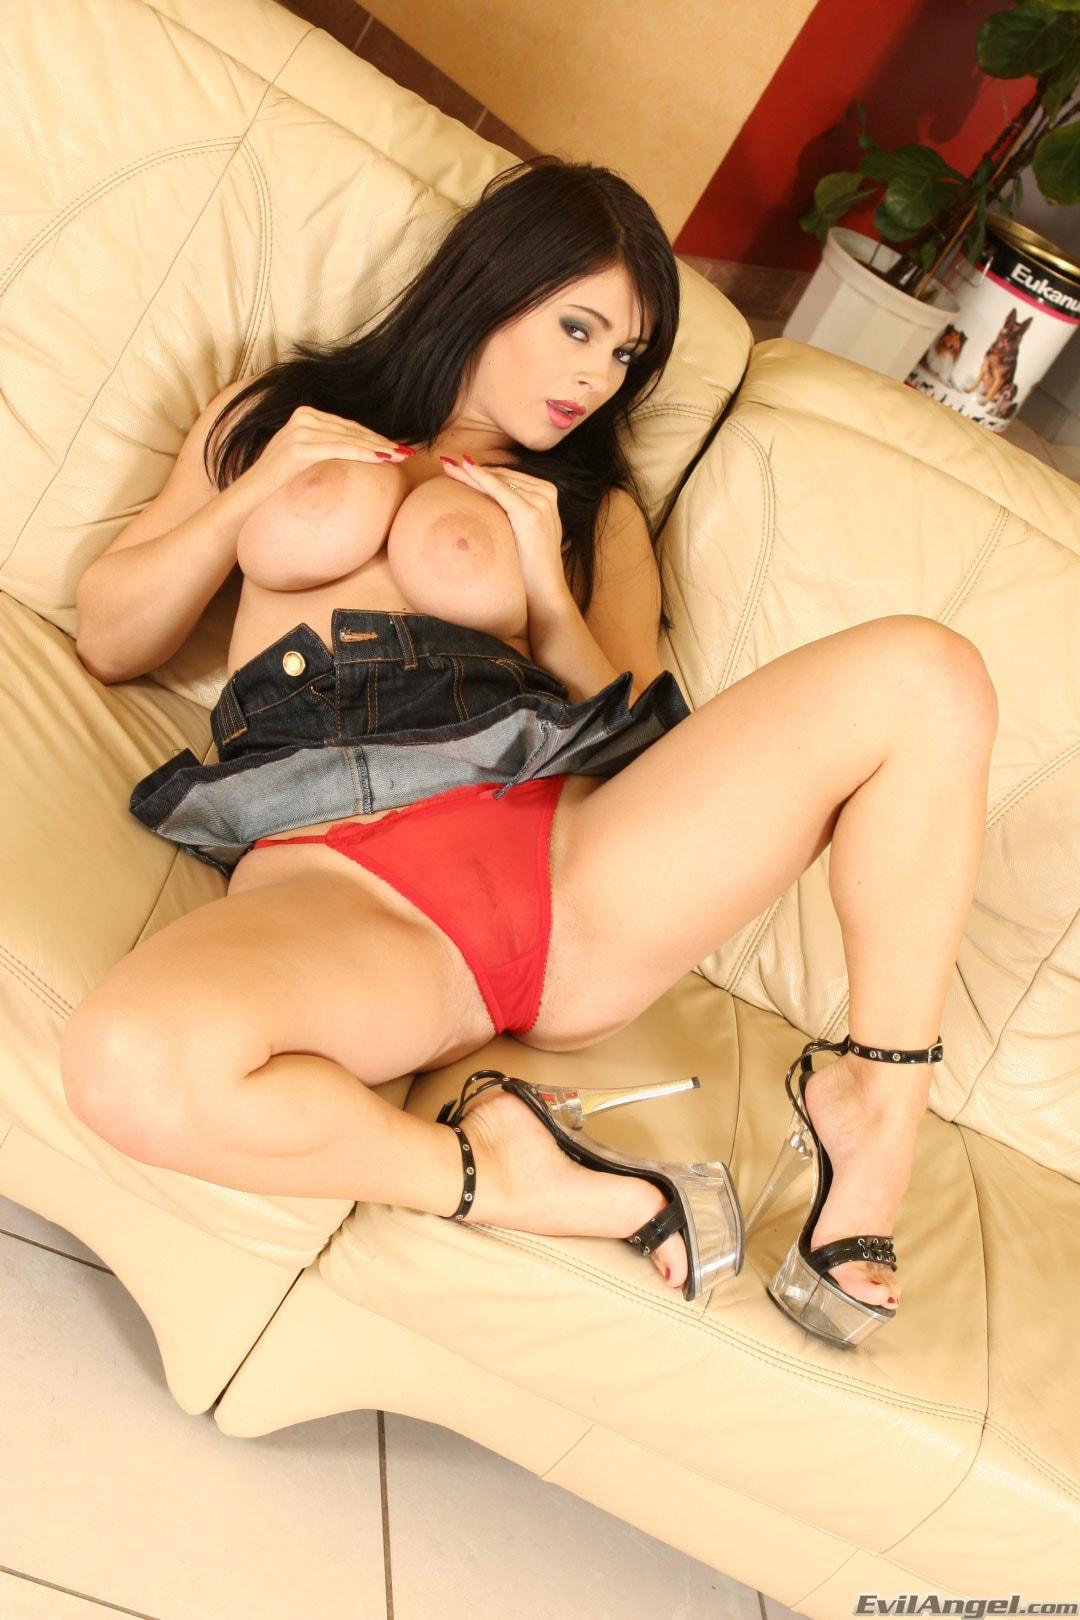 Evil Angel 'Big Natural Tits 17' starring Kristi Klenot (Photo 2)